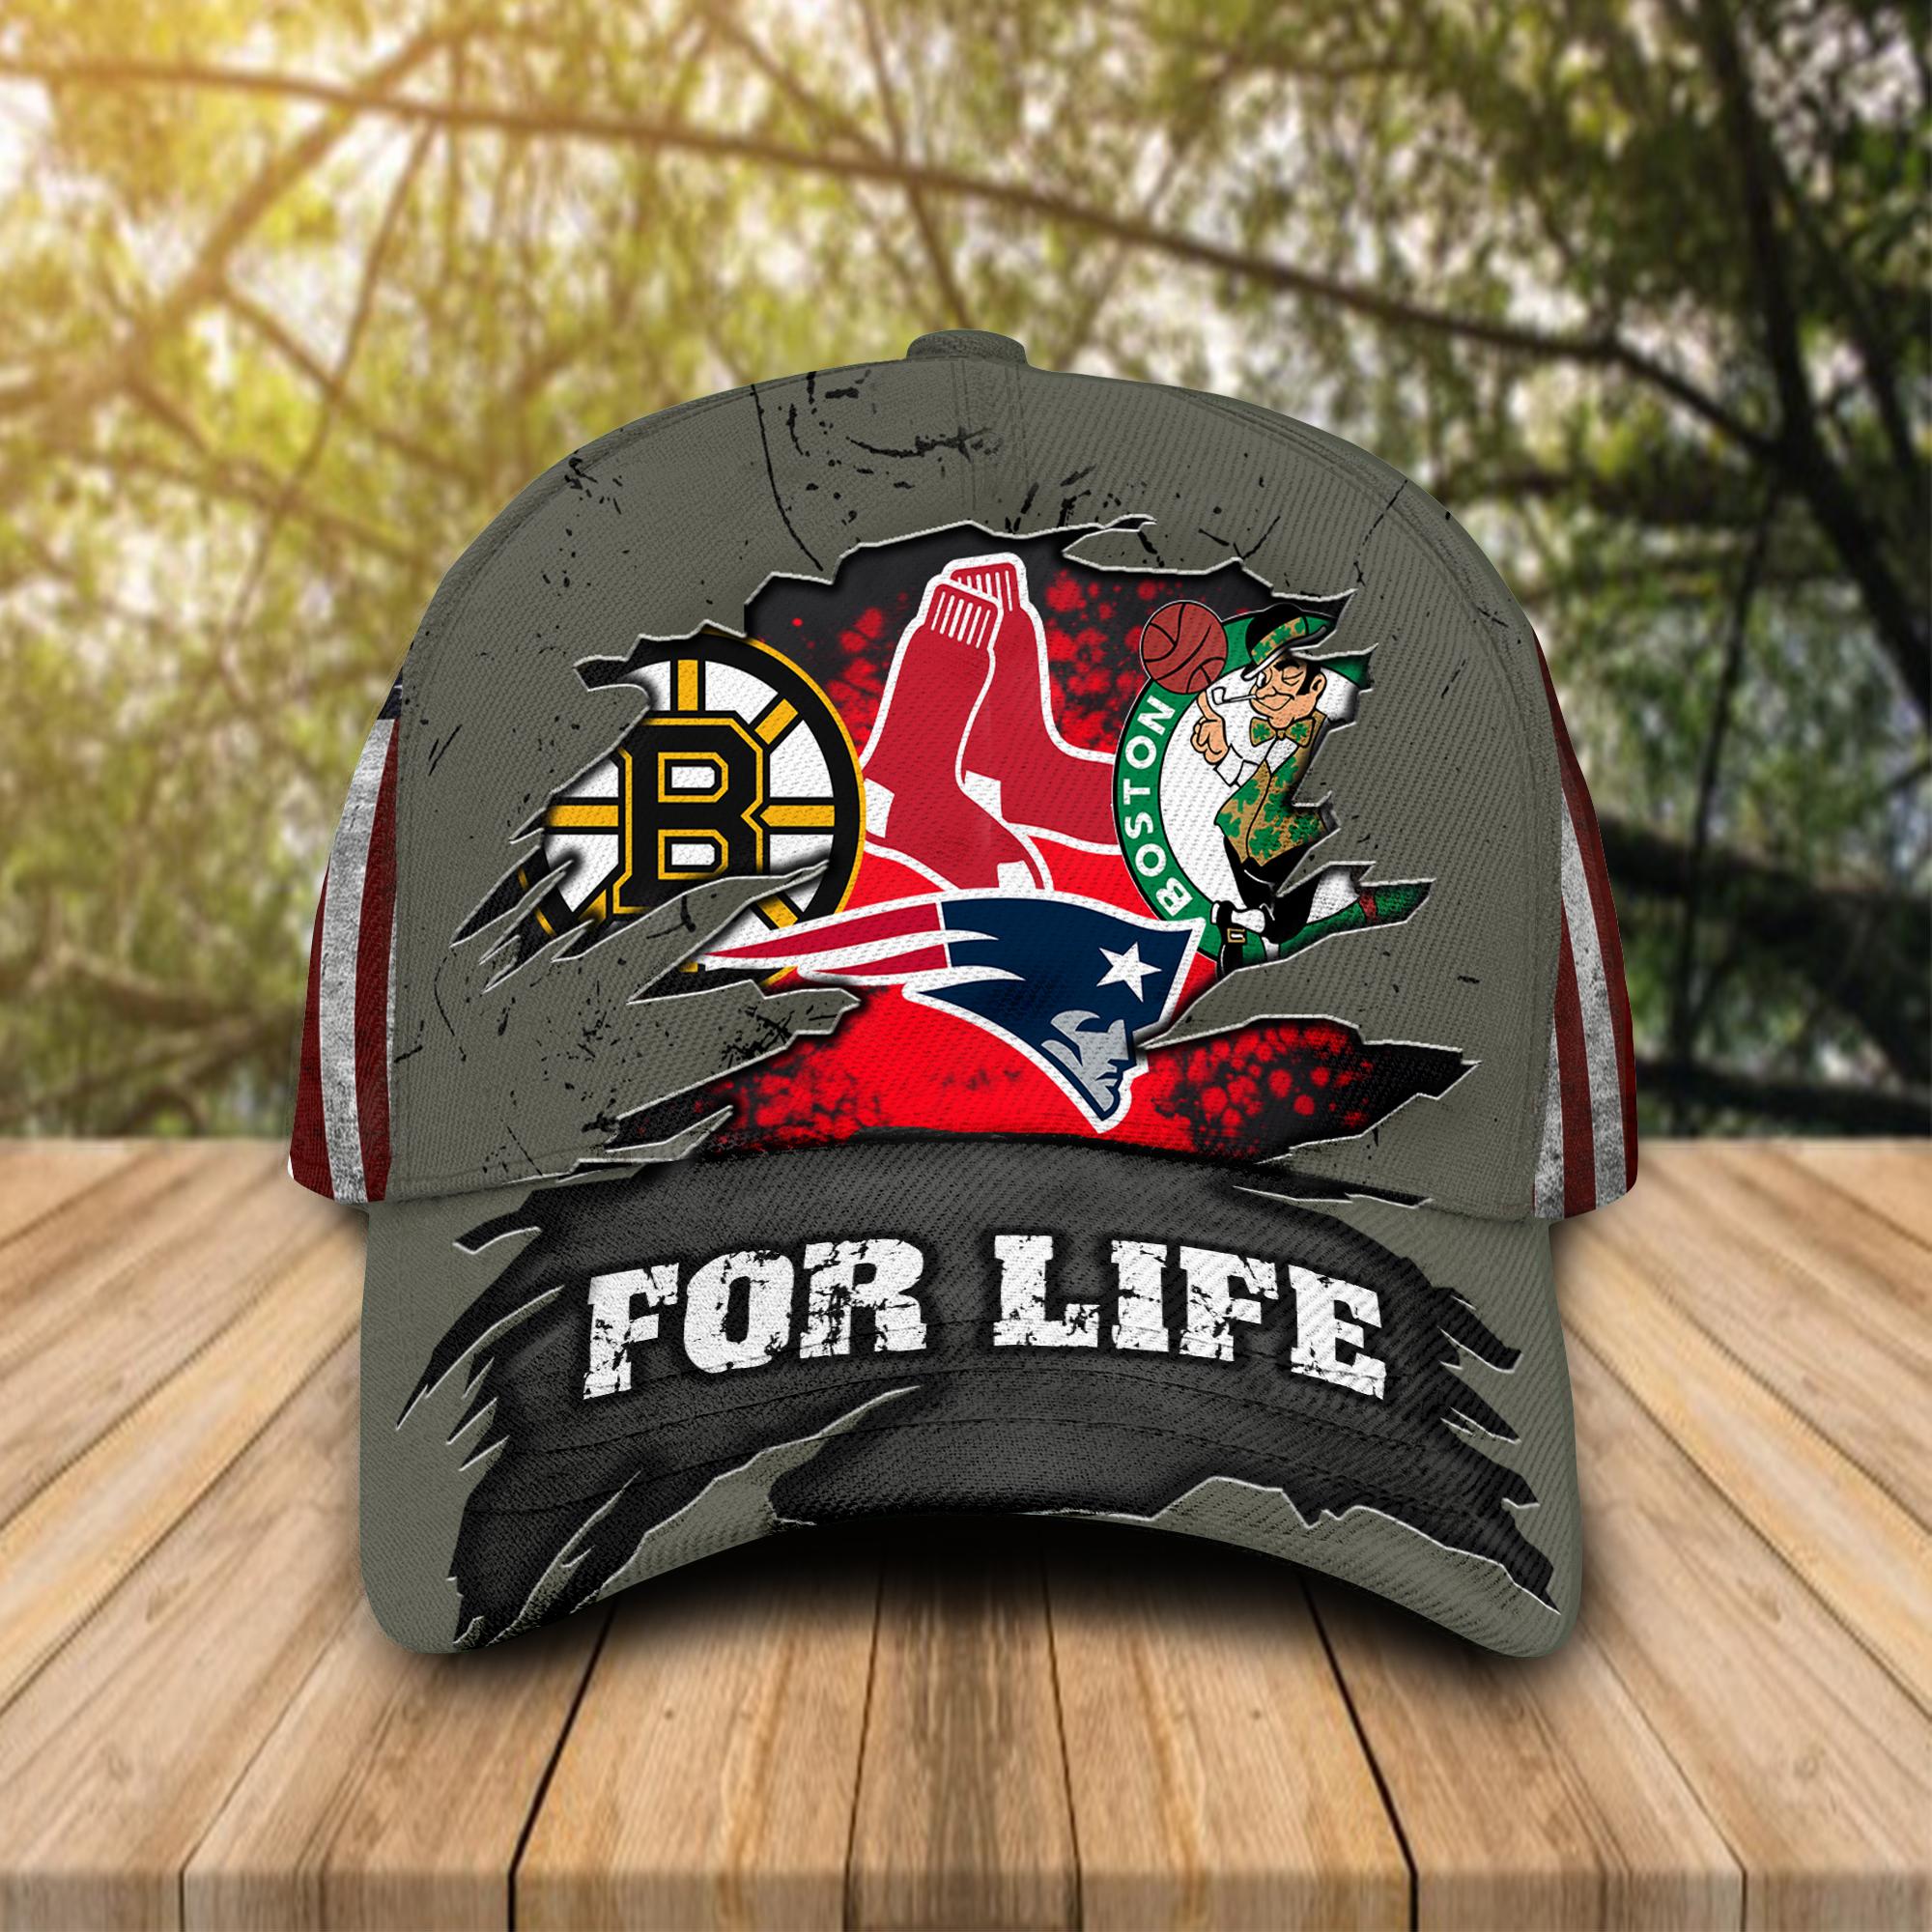 Boston-Celtics-New-England-Patriots-Boston-Bruins-Boston-Red-Sox-For-Life-Cap-Hat